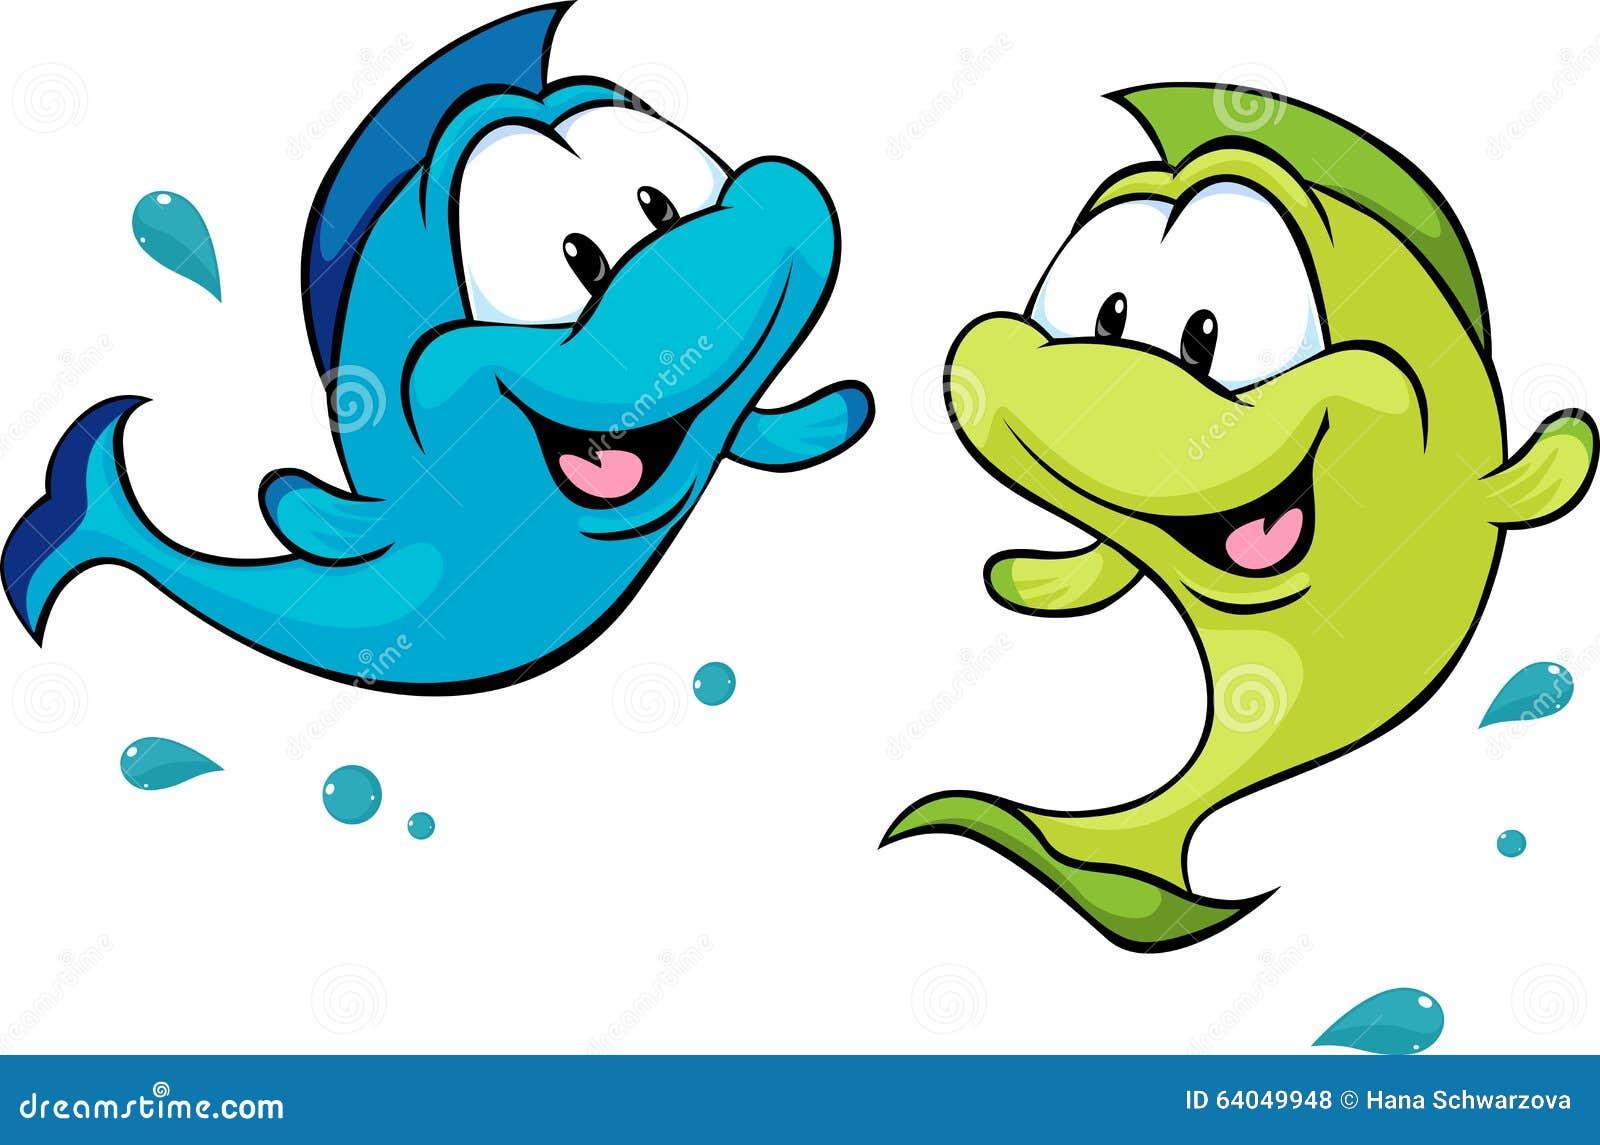 funny clipart fishing - photo #12